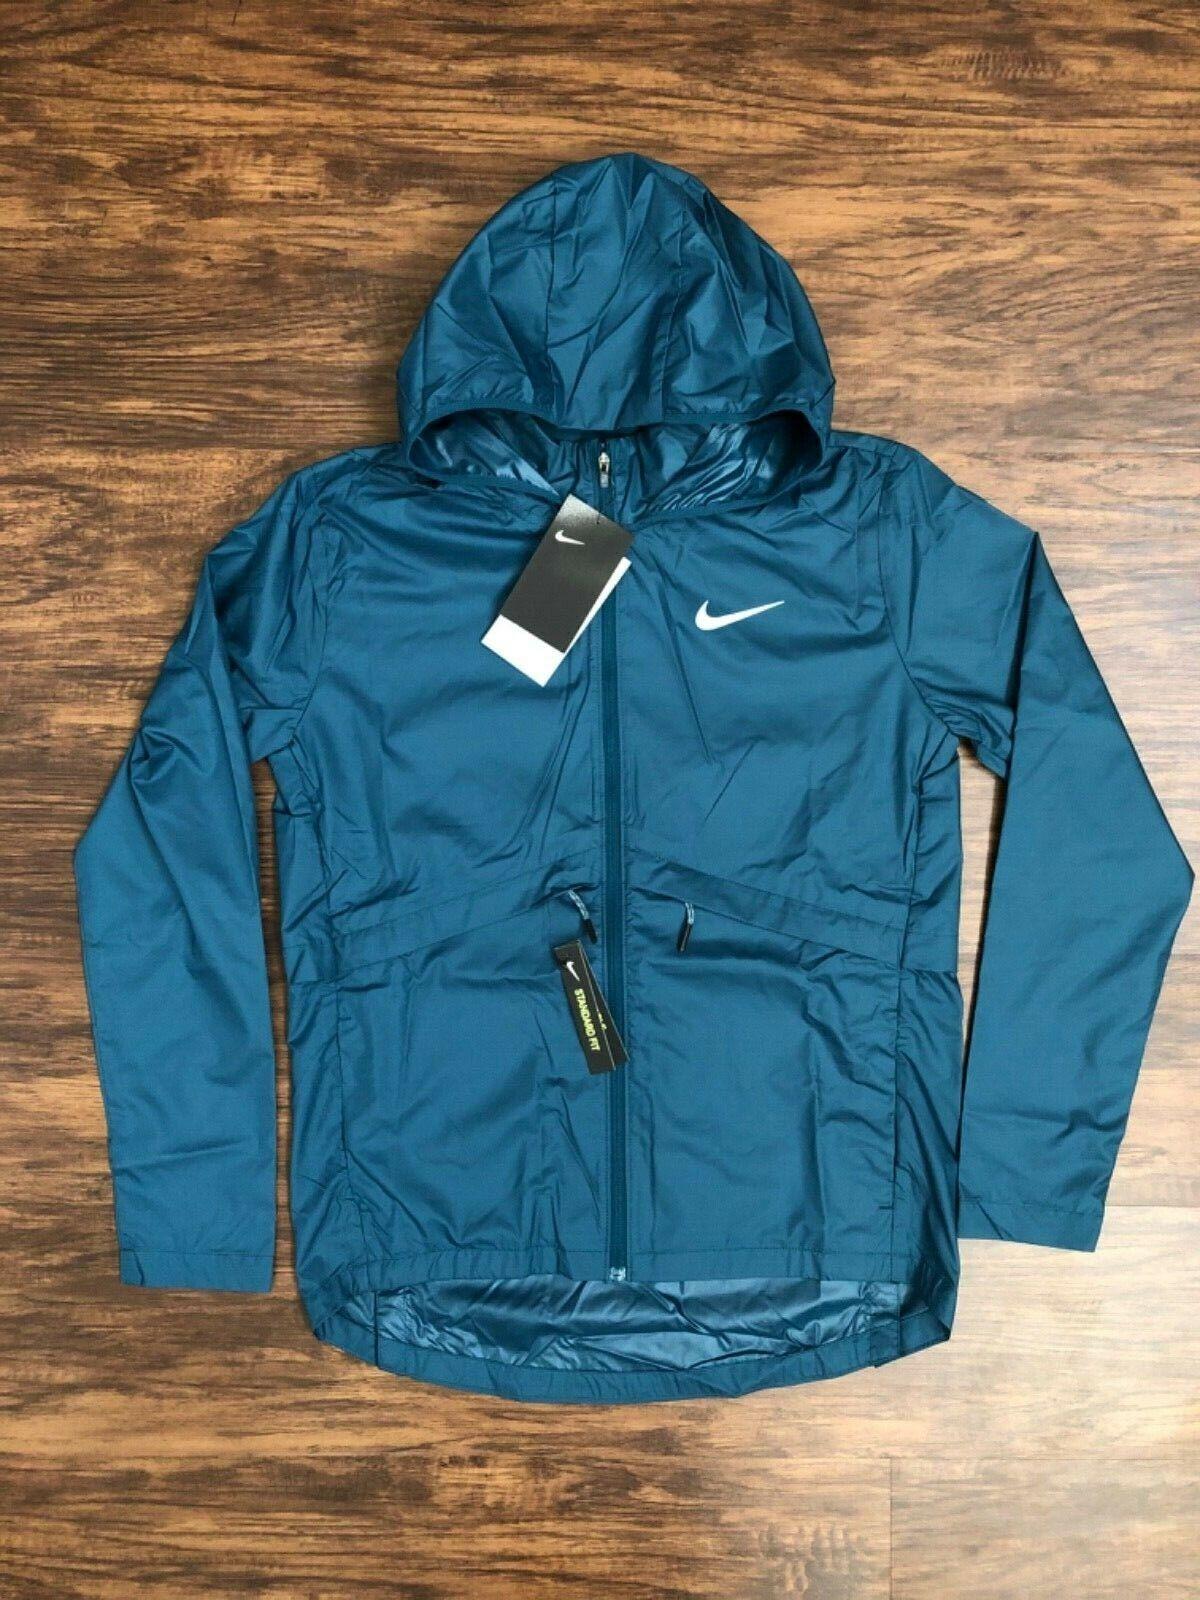 Women's Nike Essential Packable Running Rain Jacket Juniper